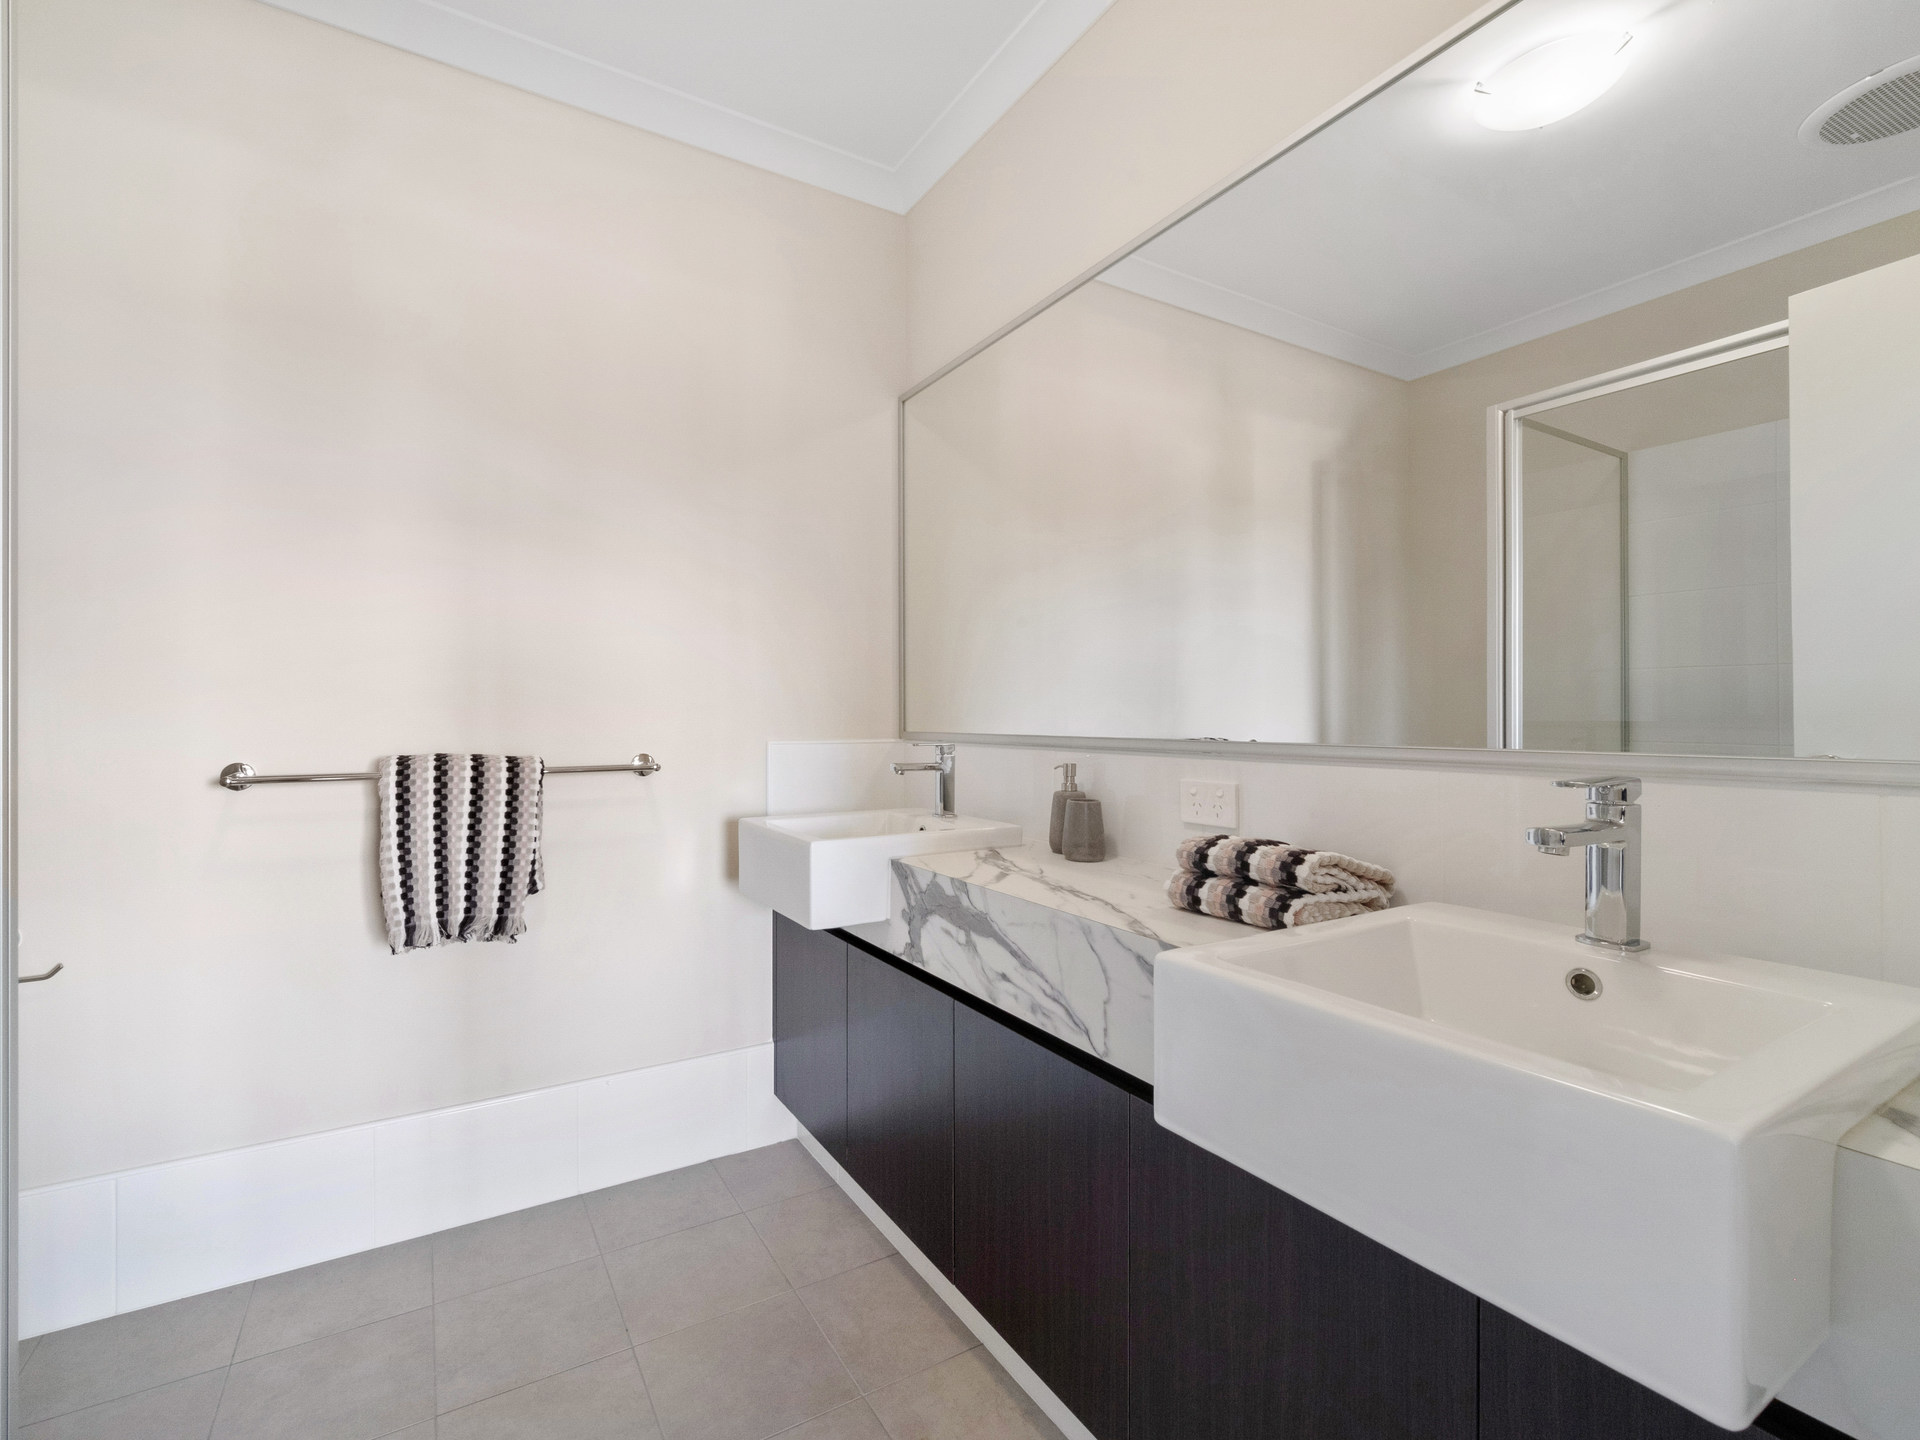 Room 1 29A Hampton Bathroom